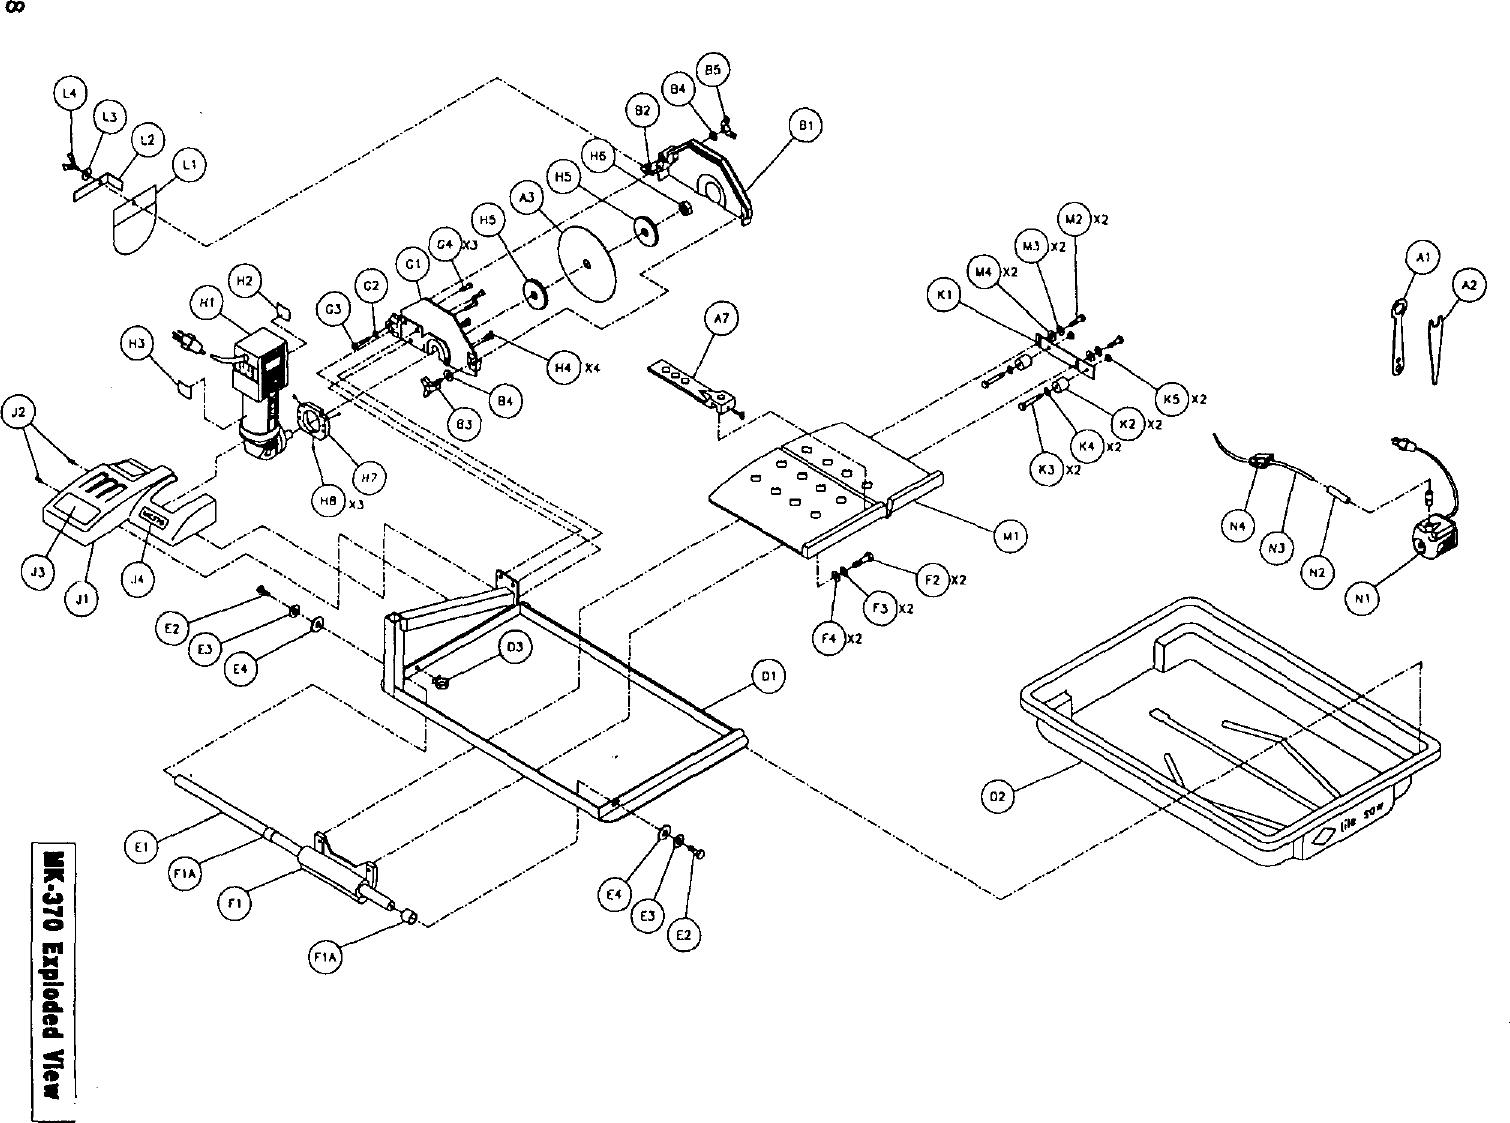 gfci wiring diagram 115v best wiring library Honeywell Thermostat Wiring Diagram Wires mk diamond all saw manual l0010631 leviton gfci spa wiring diagram gfci wiring diagram 115v